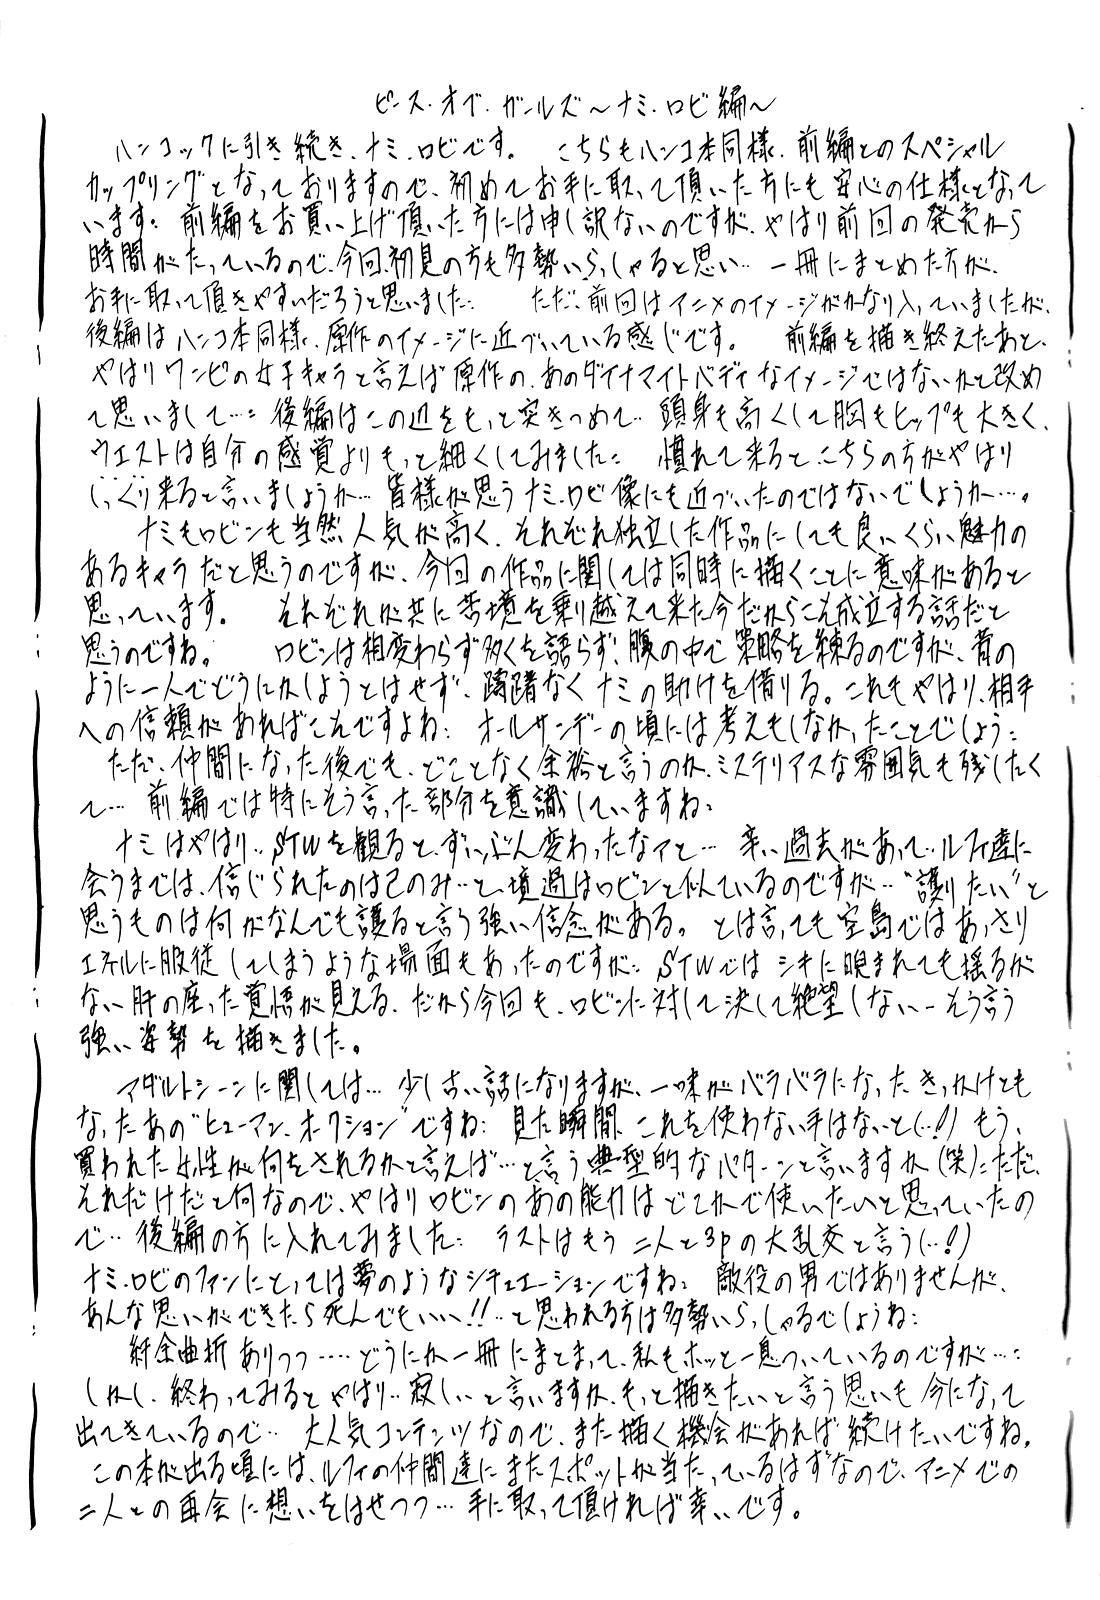 Piece of Girl's kan2 Nami-Robi Hen 35